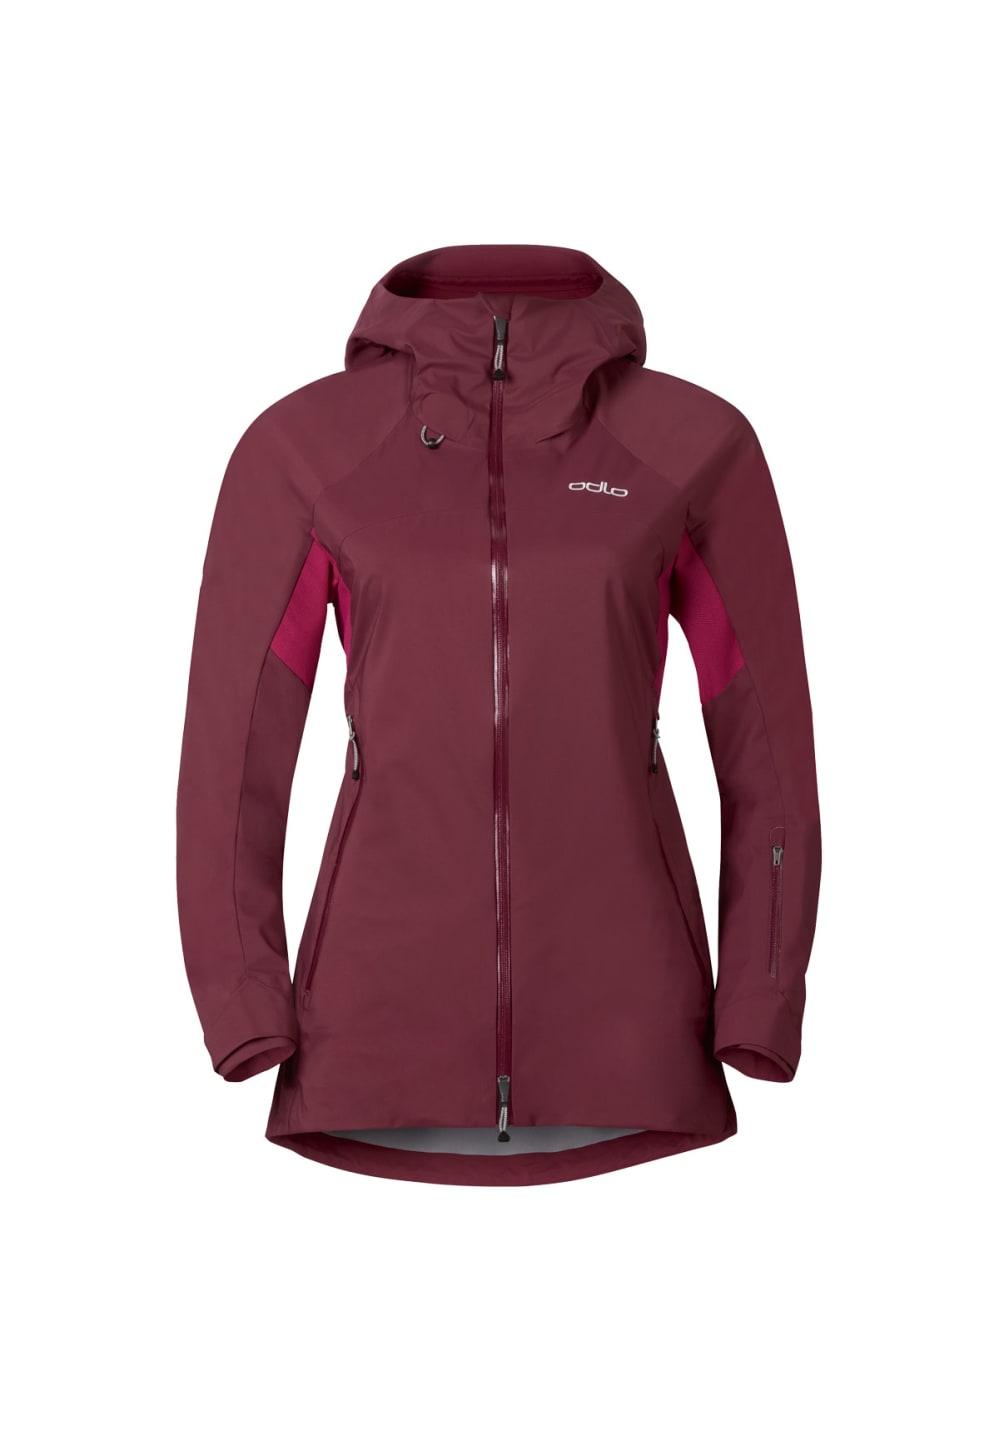 Odlo Jacket Synergy - Laufjacken für Damen - Rot, Gr. S